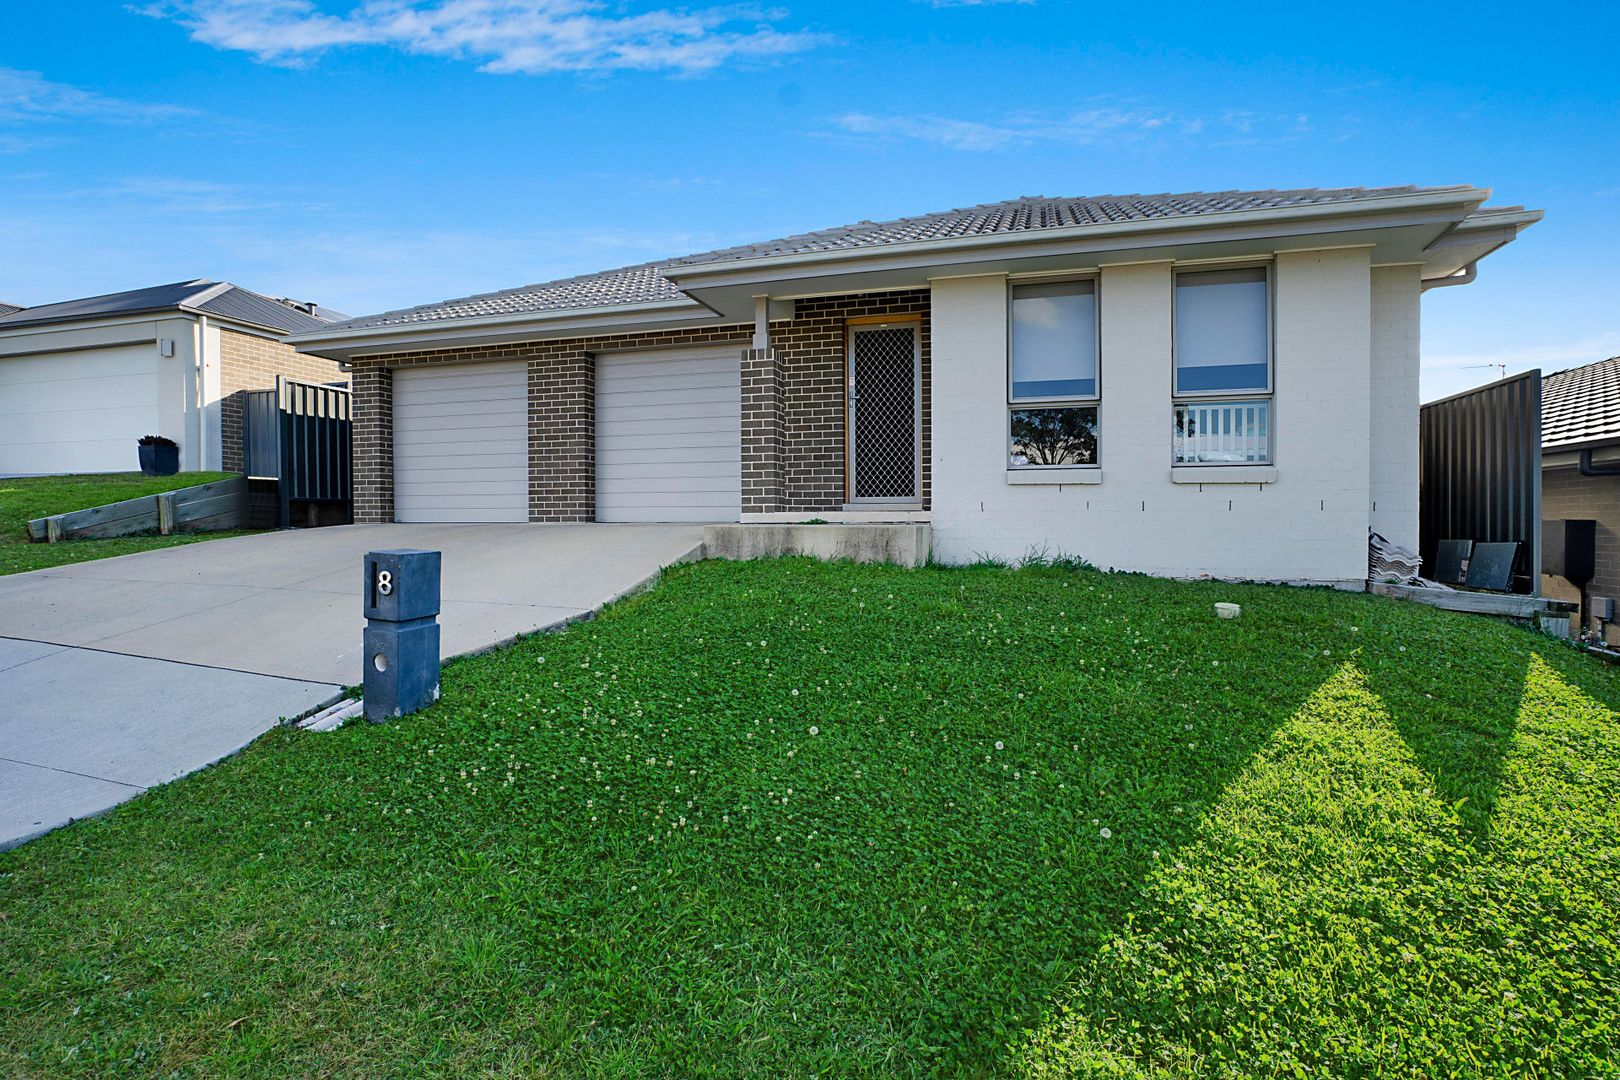 8 & 8a Sandridge Street, Thornton NSW 2322, Image 0